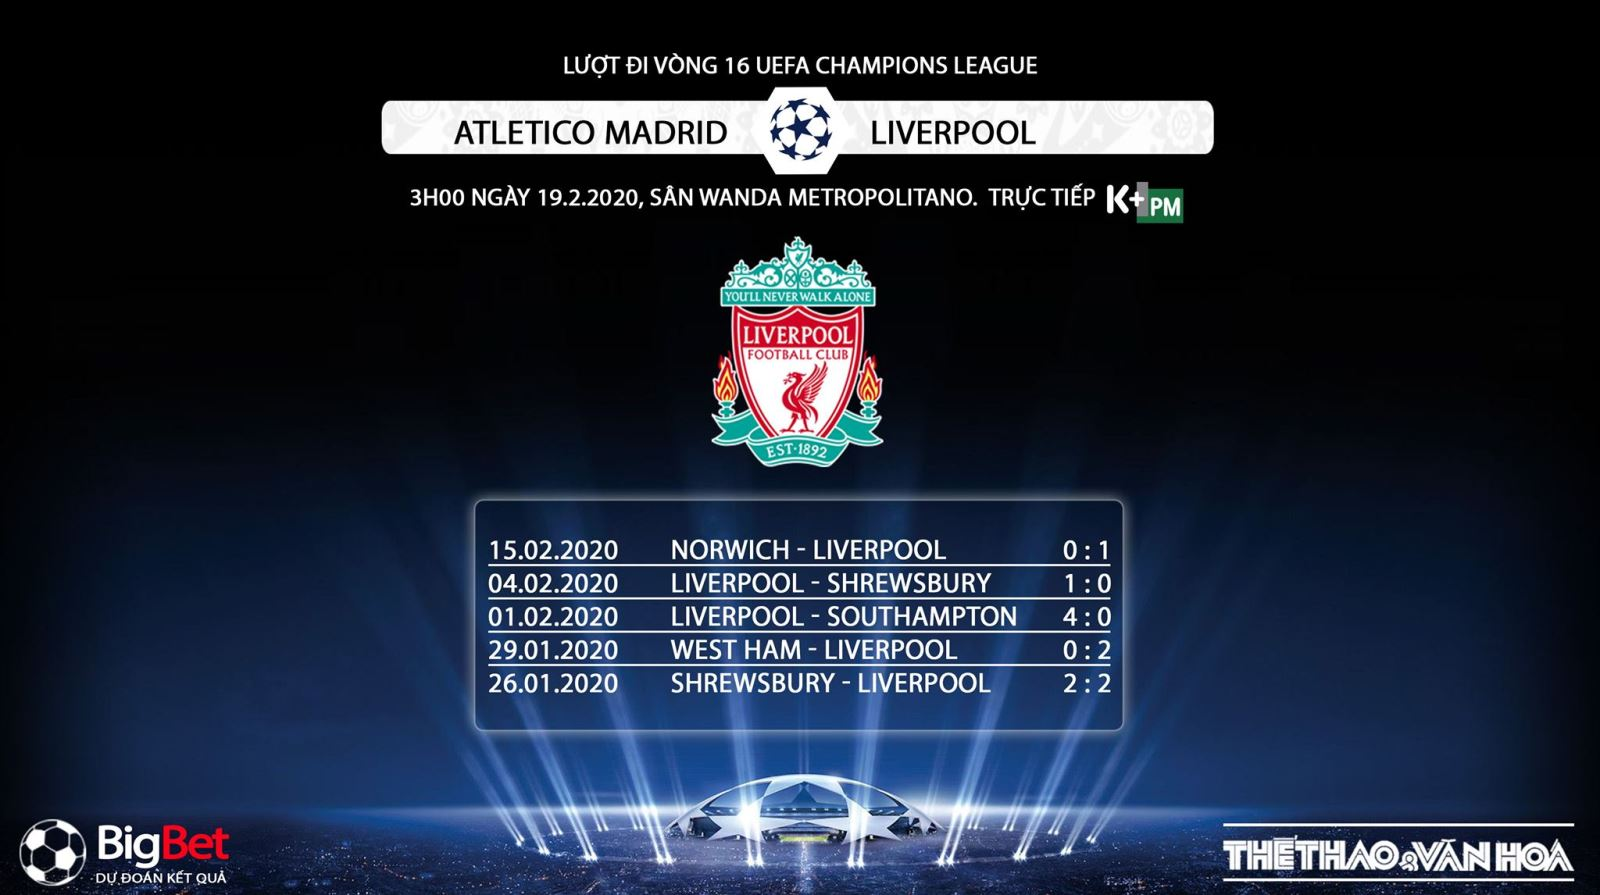 Soi kèo Atletico Madrid vs Liverpool, K+PM, Atletico Madrid vs Liverpool, Atletico Madrid đấu với Liverpool, Atletico Madrid, Liverpool, soi kèo, nhận định, Cúp C1